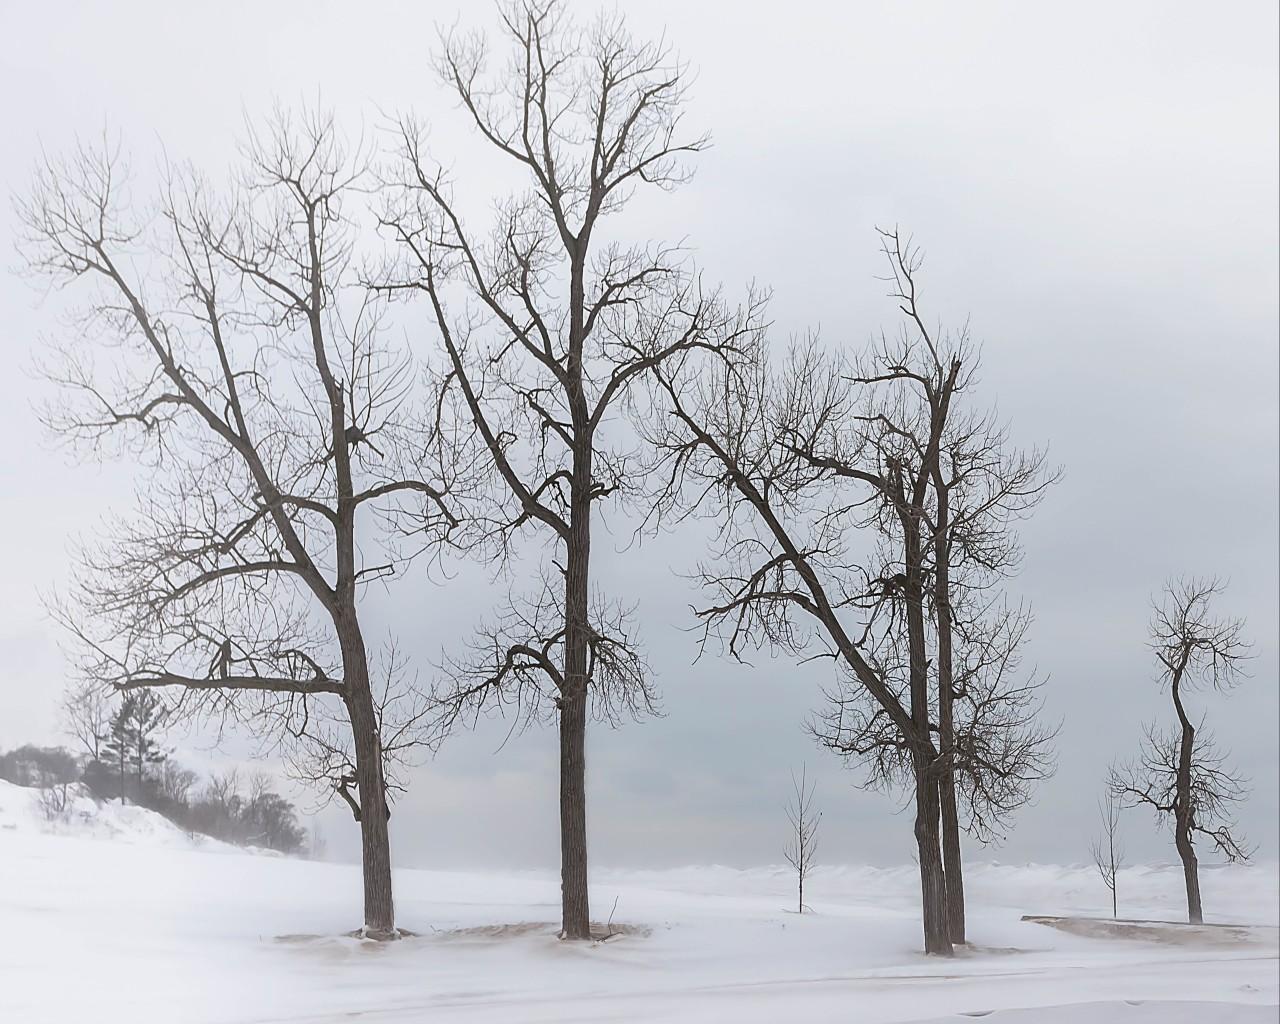 Beach Trees in Winter